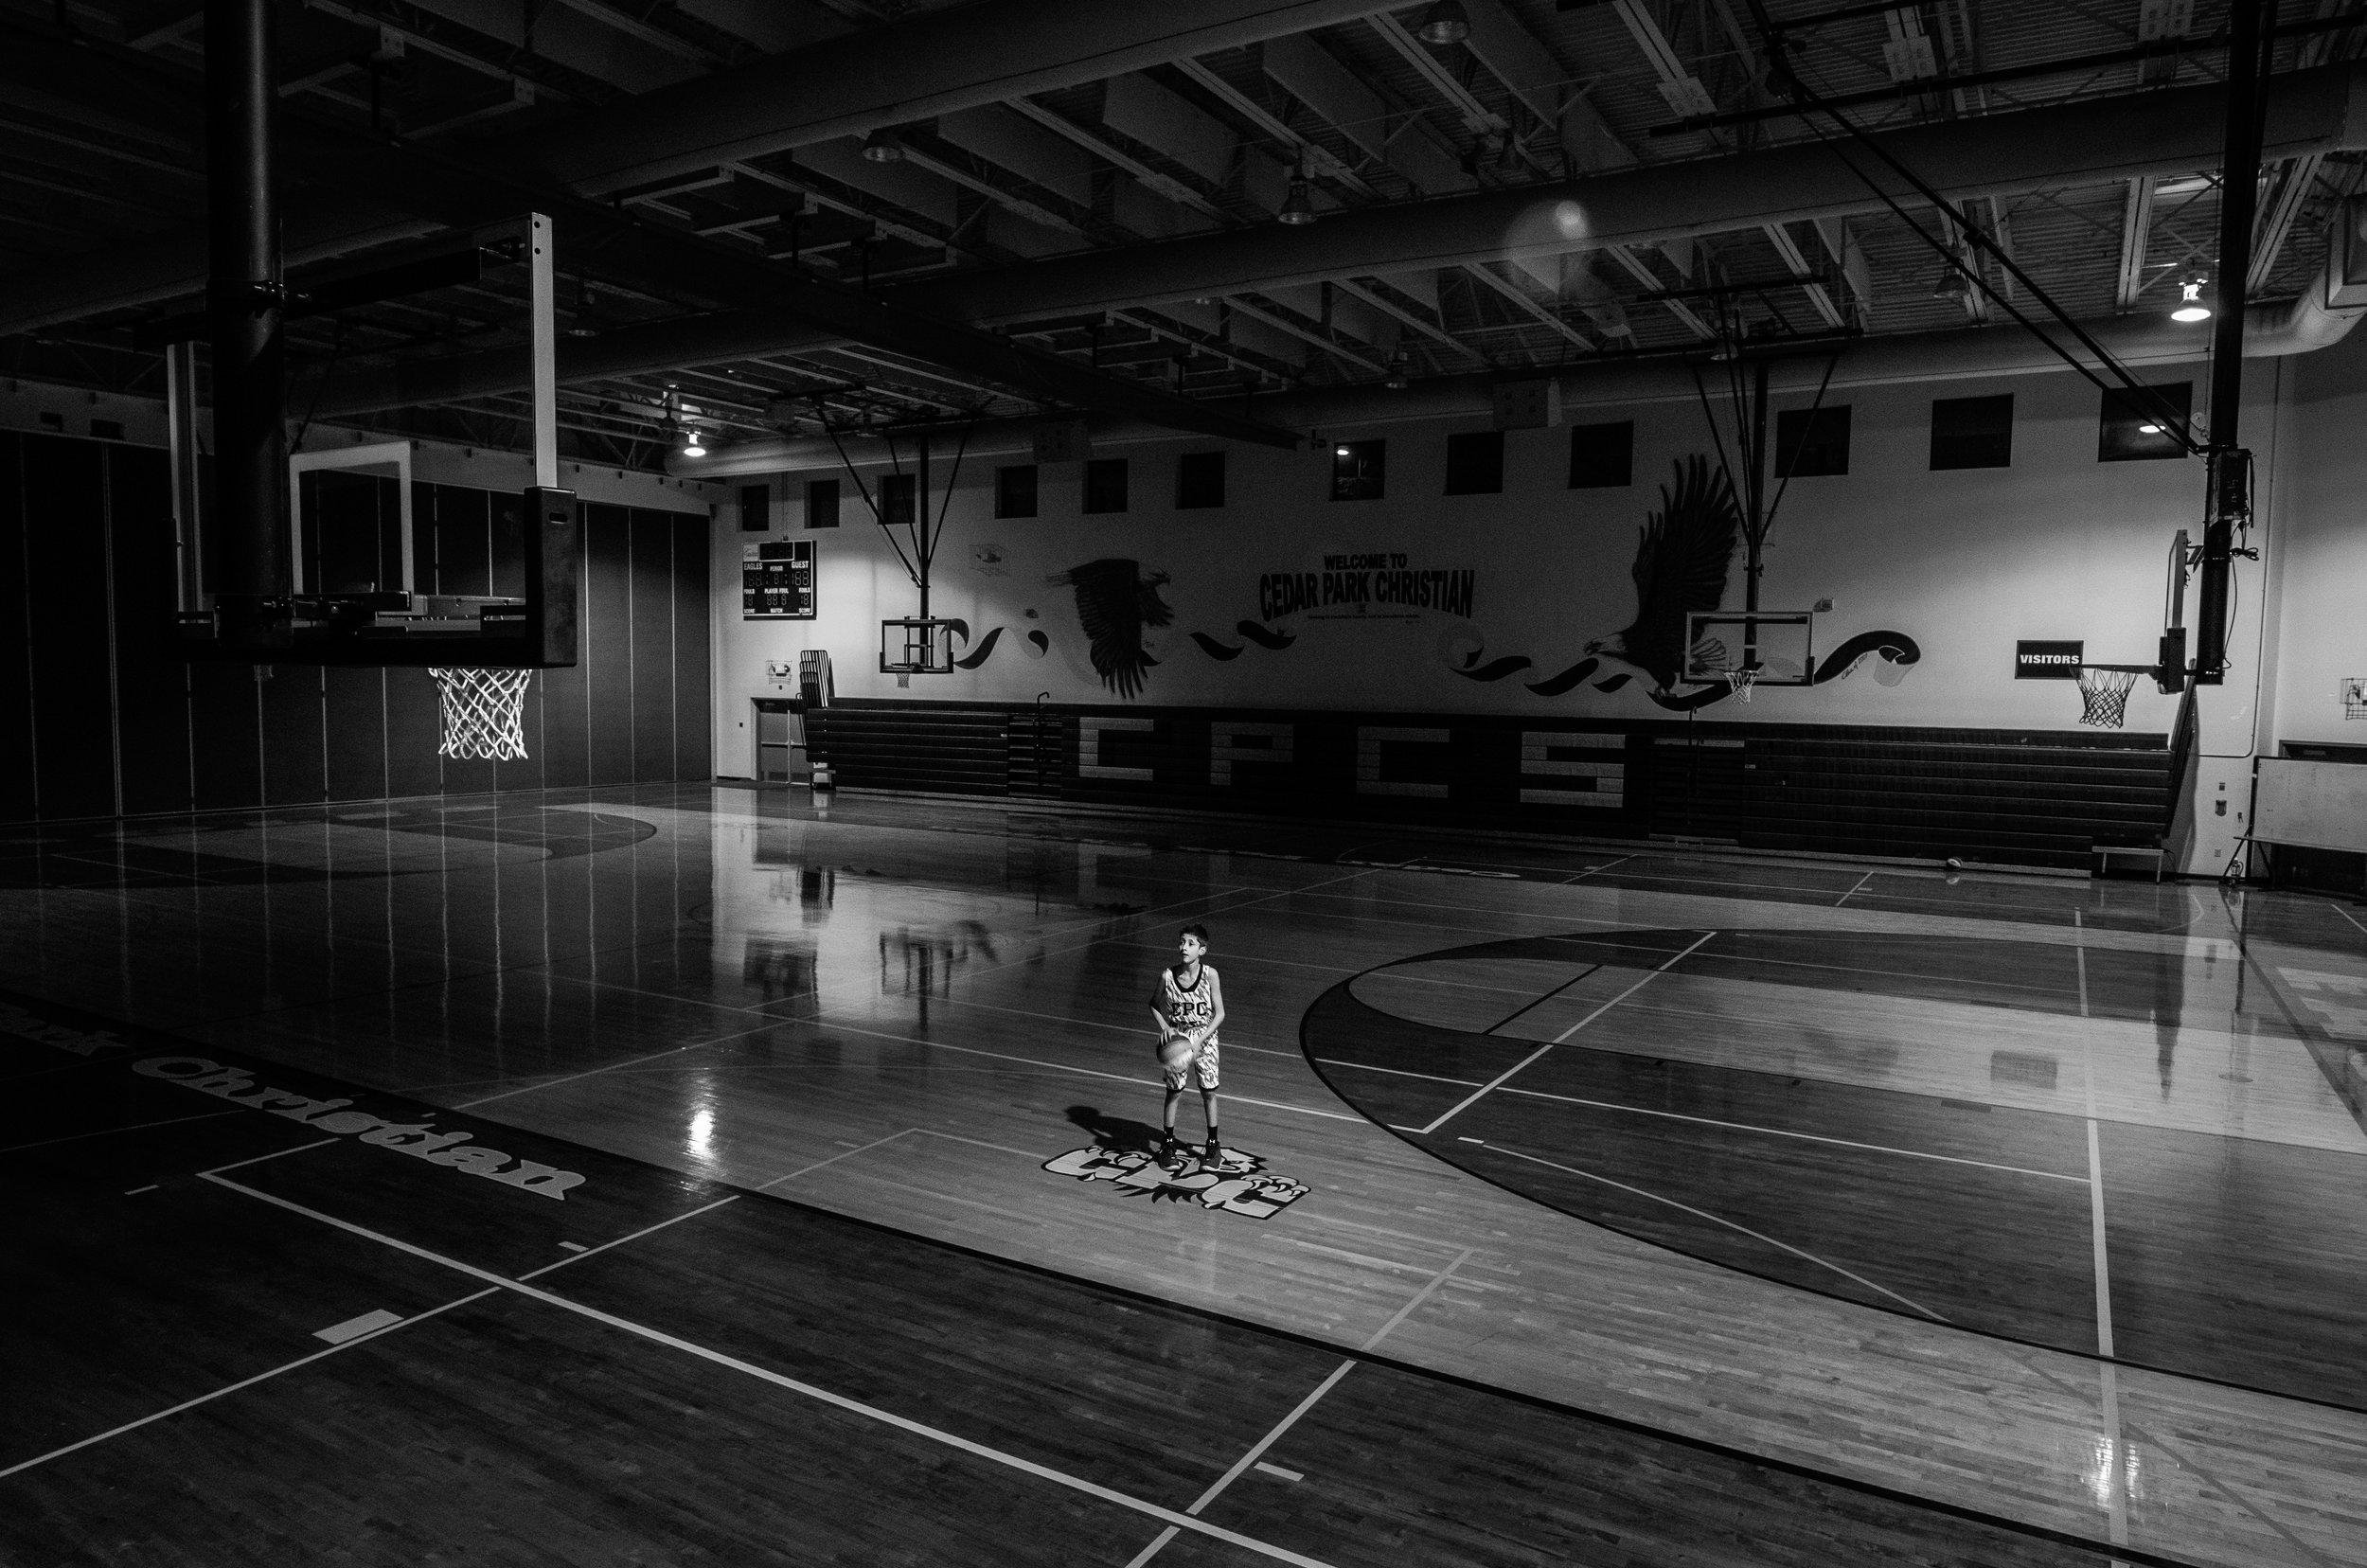 negative-space-young-boy-basketball-gym-black-white-jesse-orrico.jpg